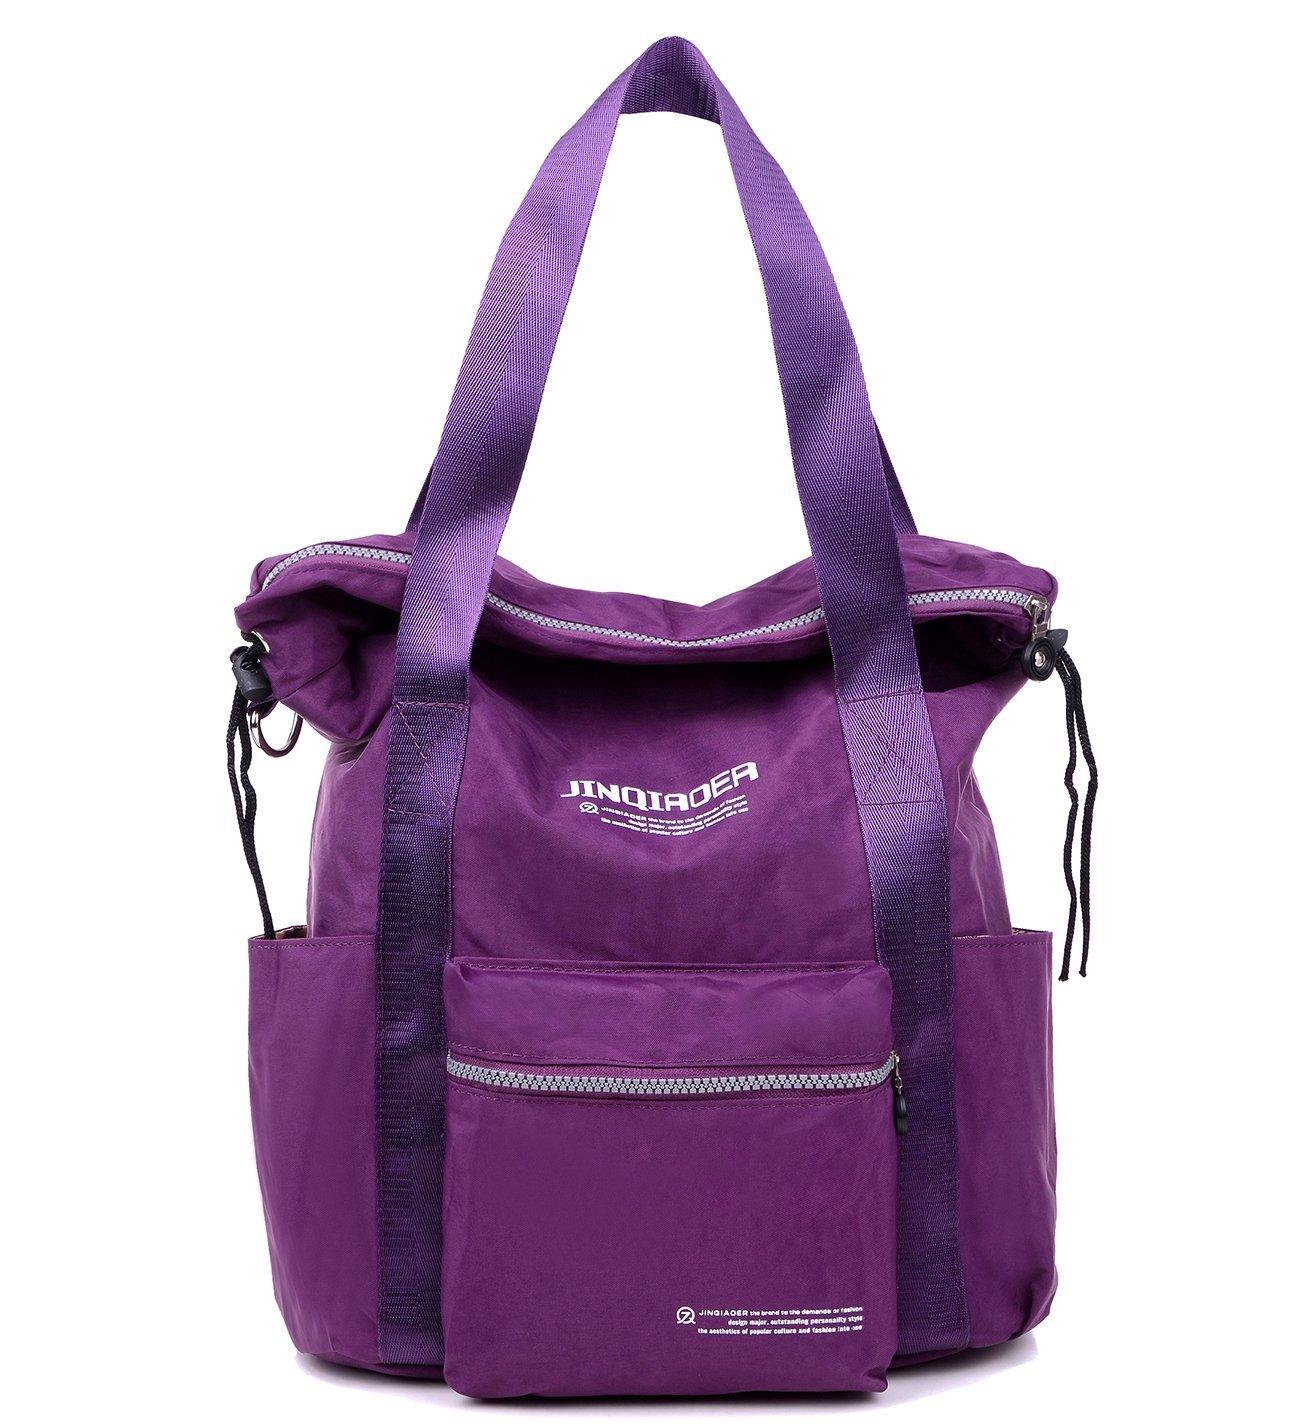 Get Quotations Supa Modern Womens Handbag Top Handle Shoulder Bag Backpack Crossbody Baggy Tote Travel